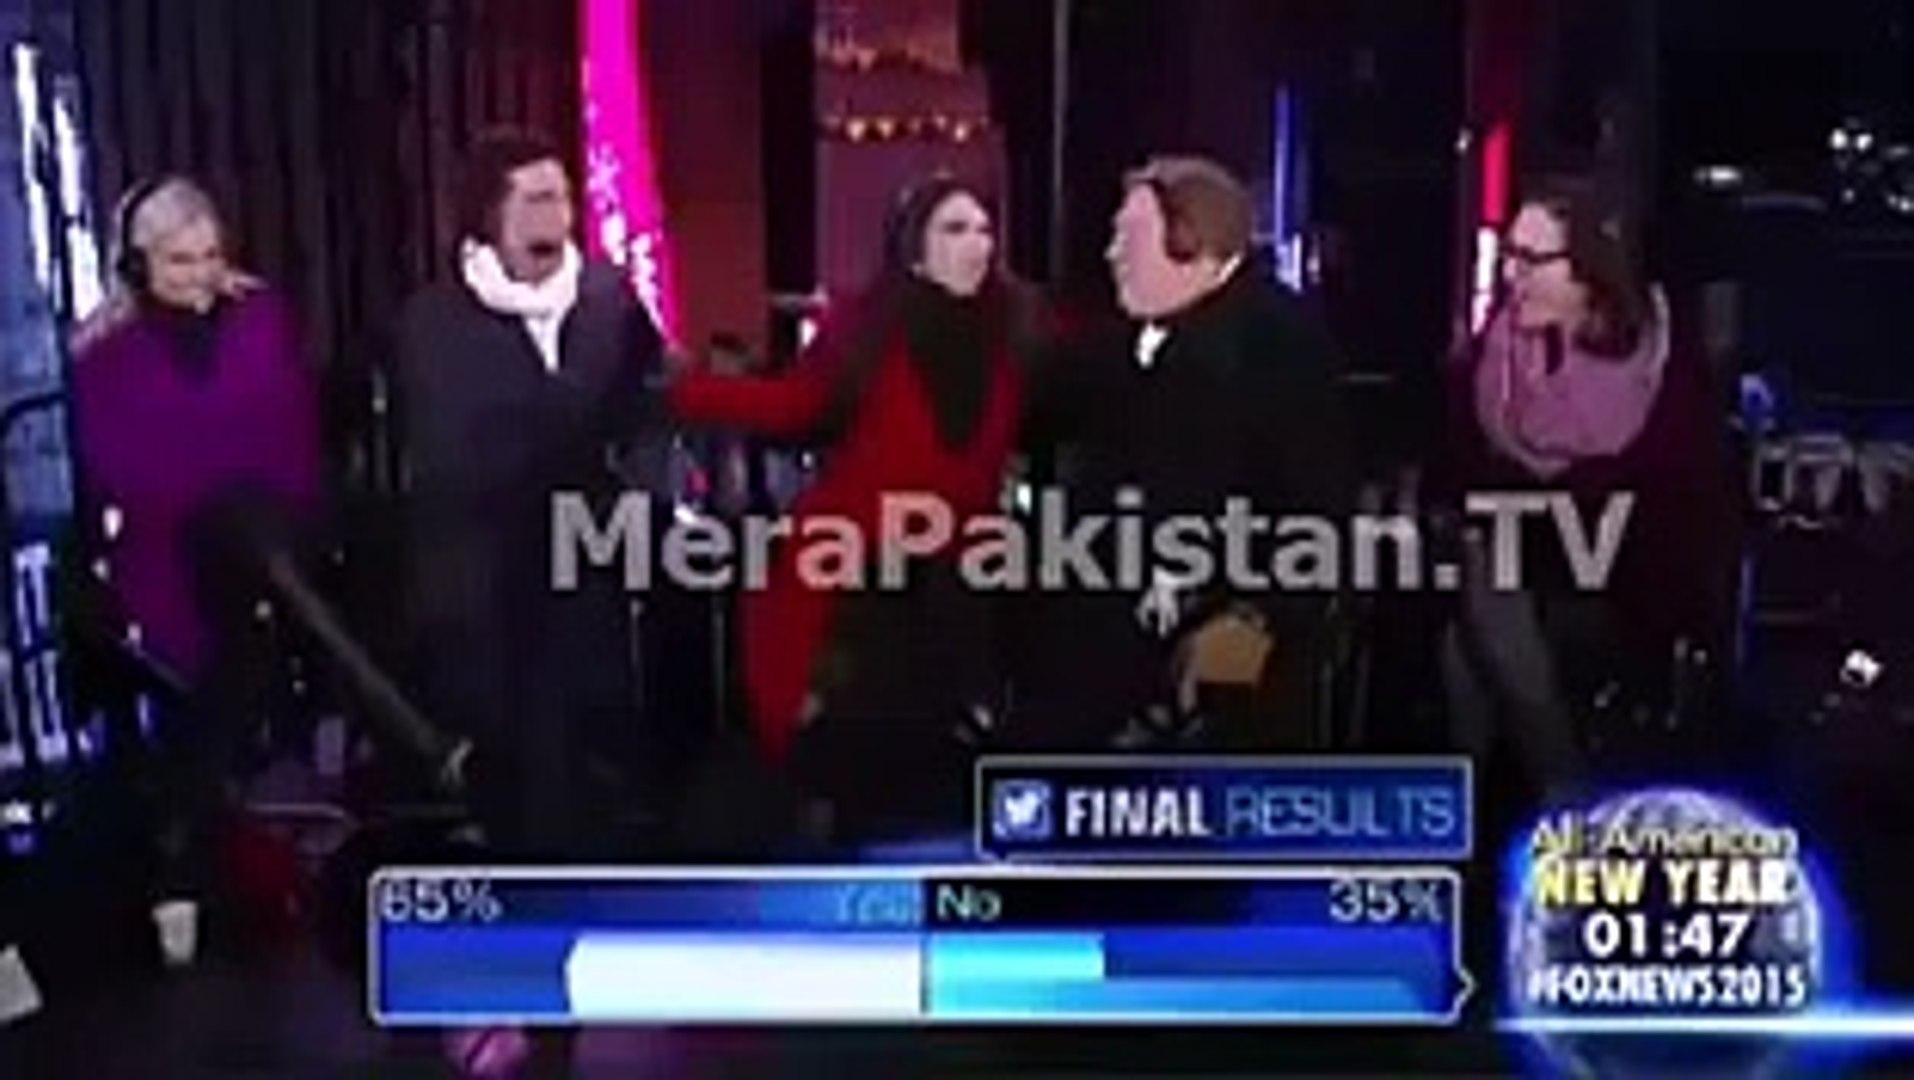 Reham-Khan-Wife-Of-Imran-Khan-Kissing-In-A-Live-Show